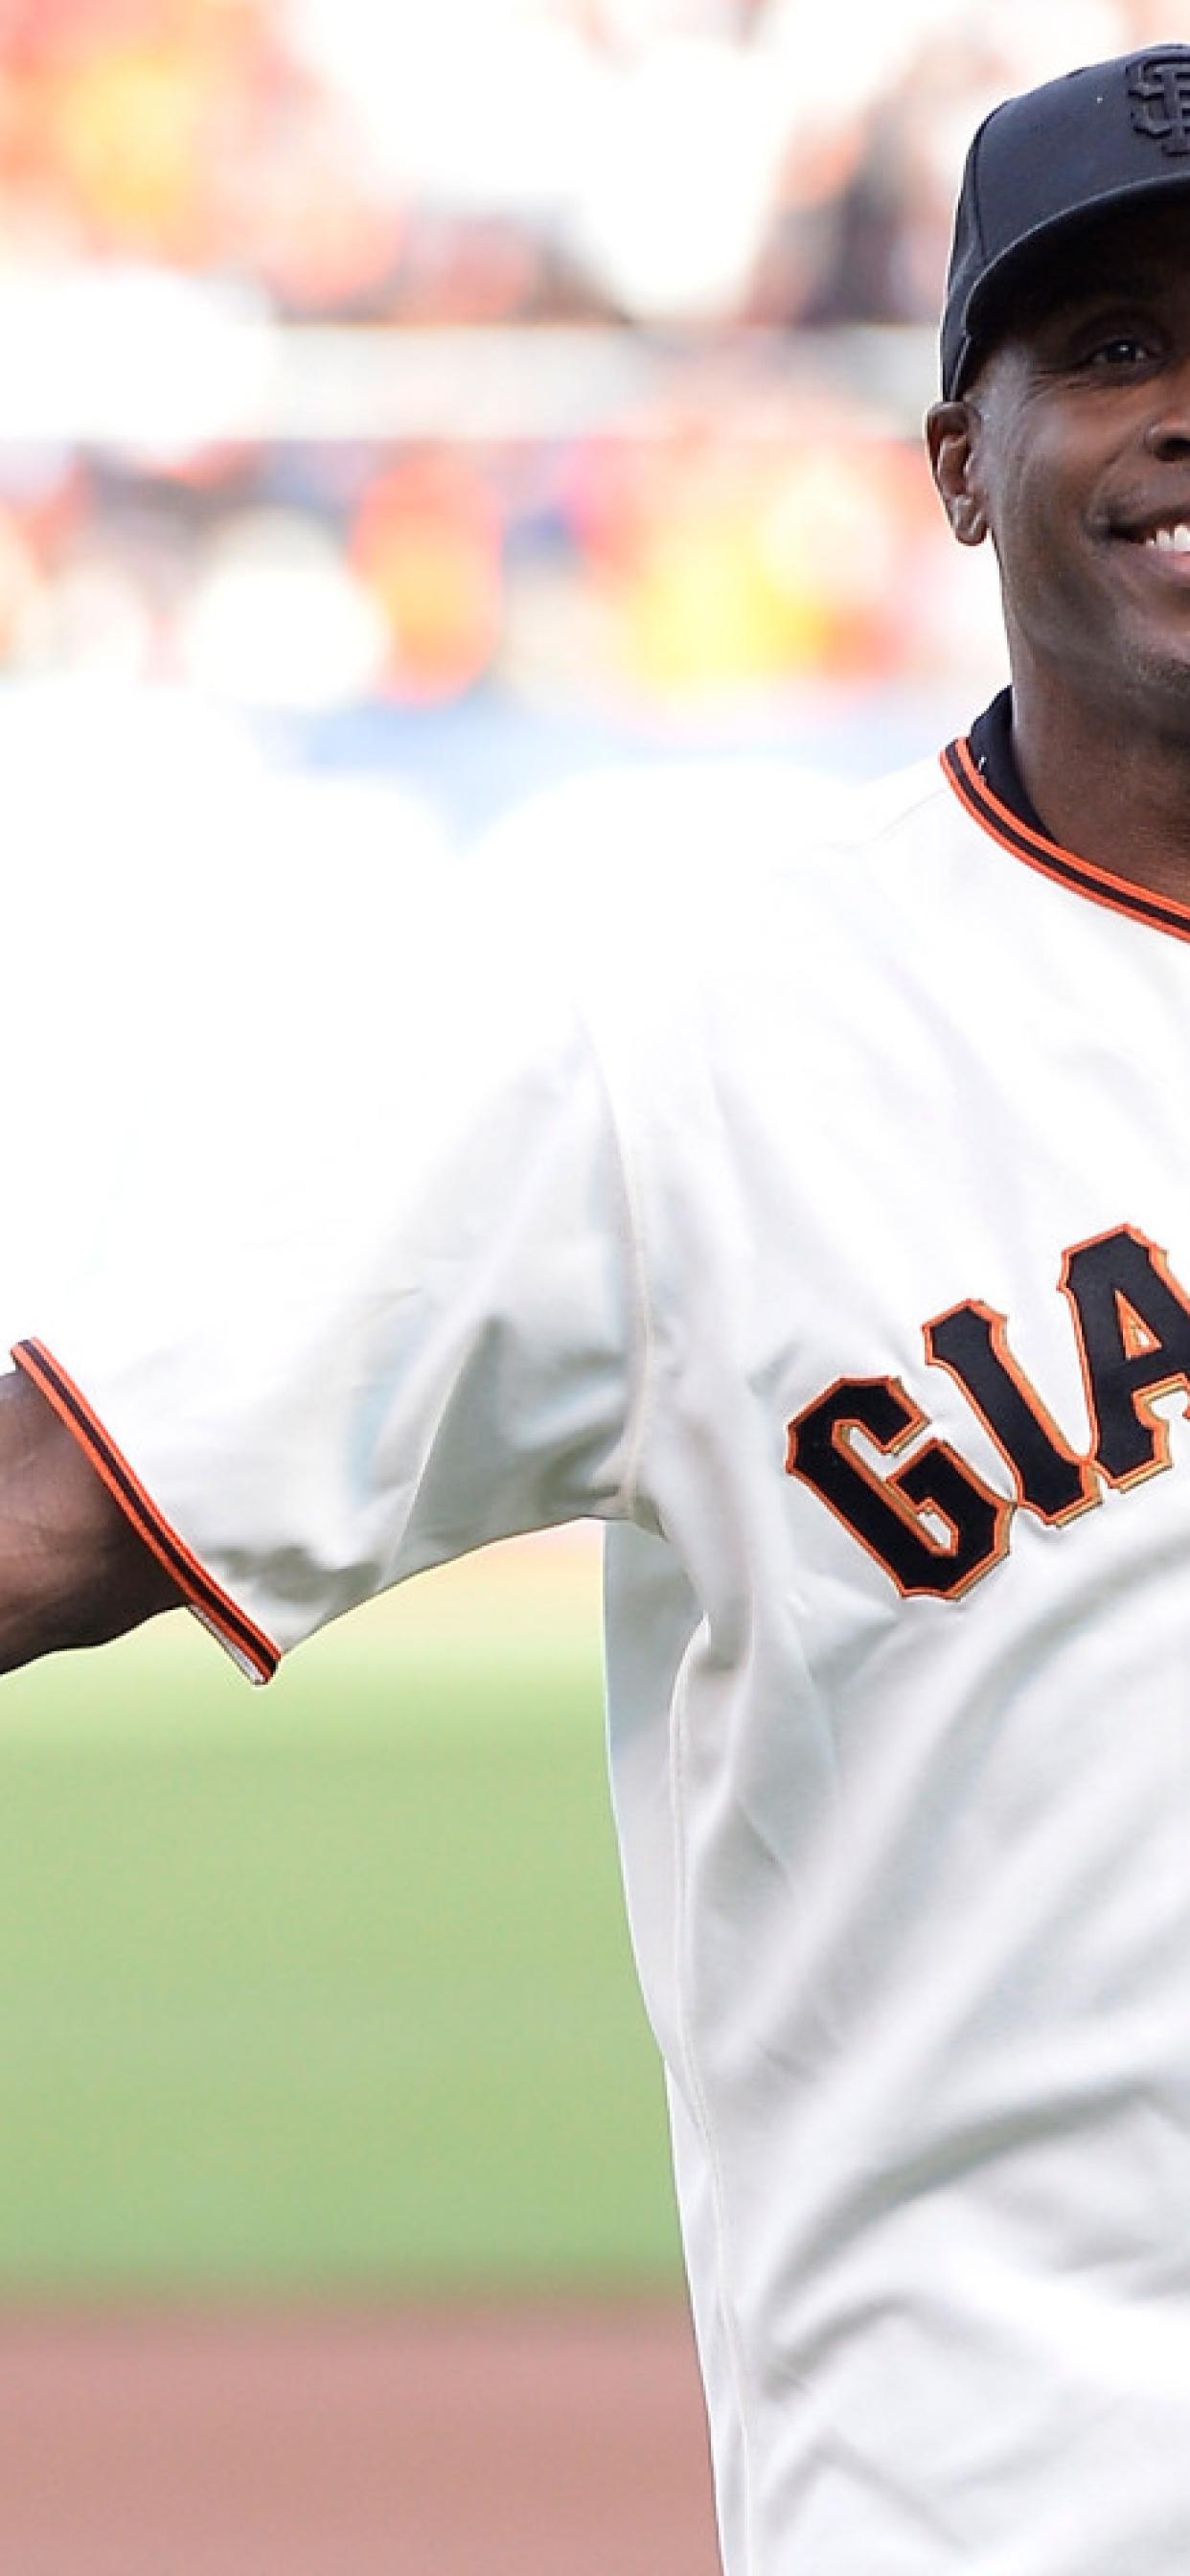 1242x2688 Barry Bonds Baseball Player San Francisco Giants